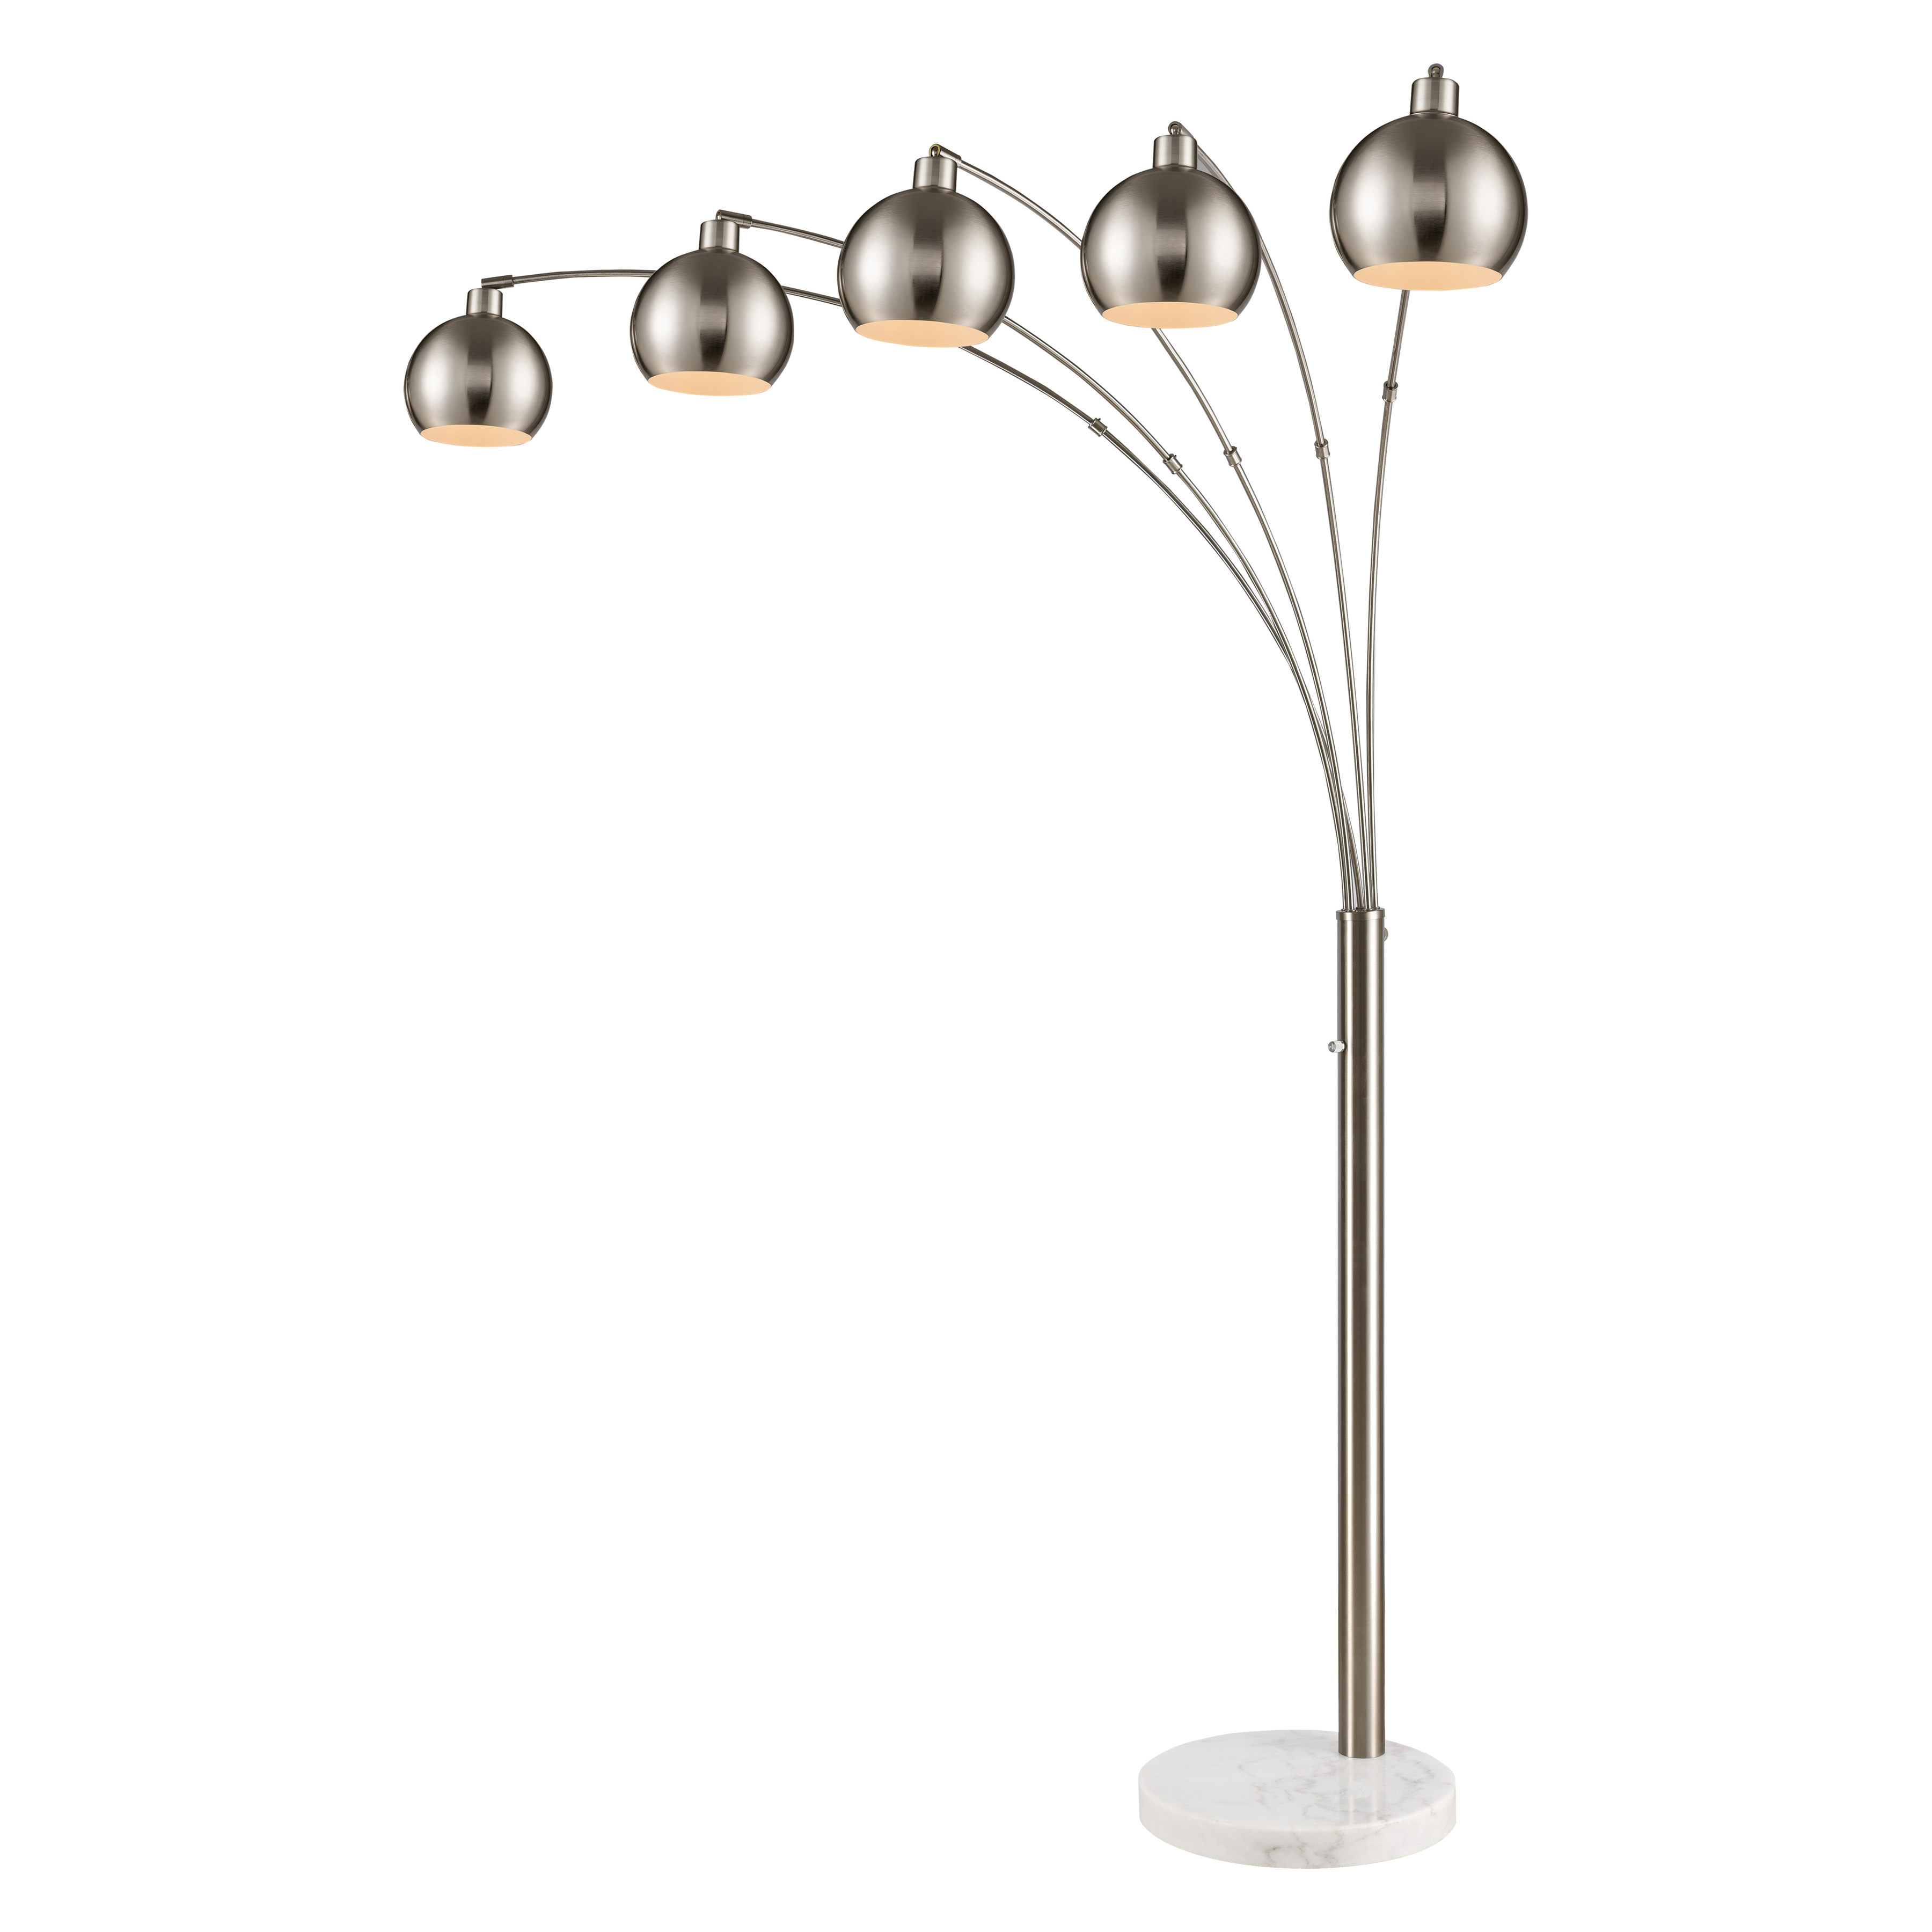 Stein World Peterborough 5-Light Floor Lamp